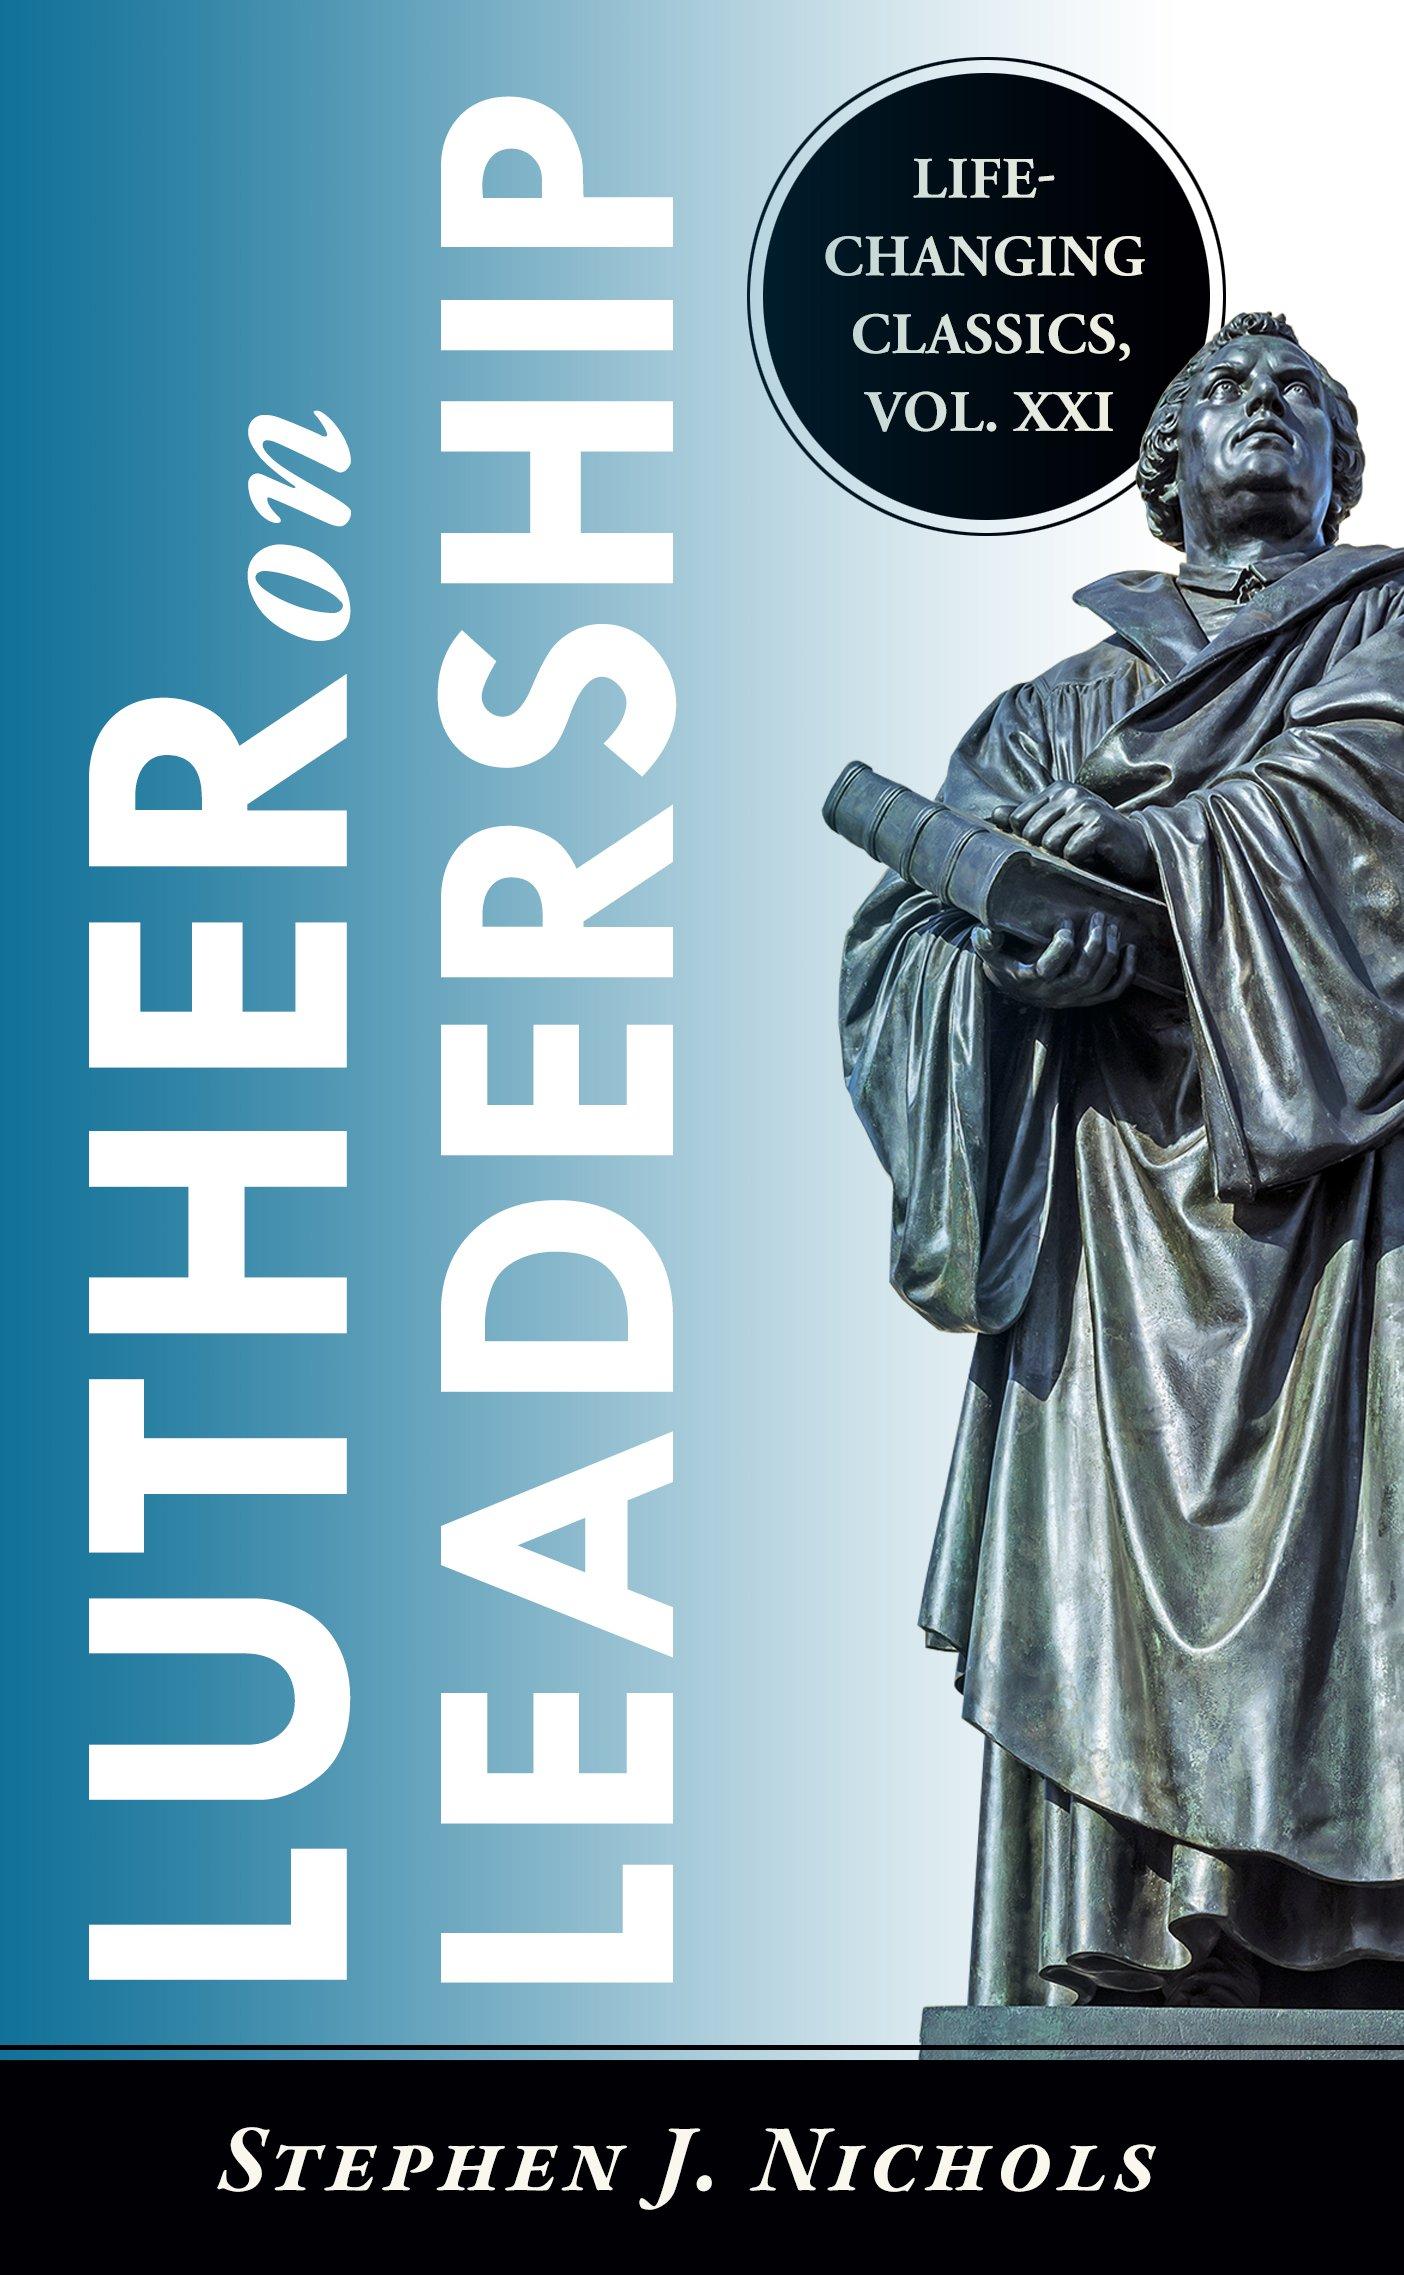 Luther on Leadership: Stephen J. Nichols: 9781936354559: Amazon.com ...